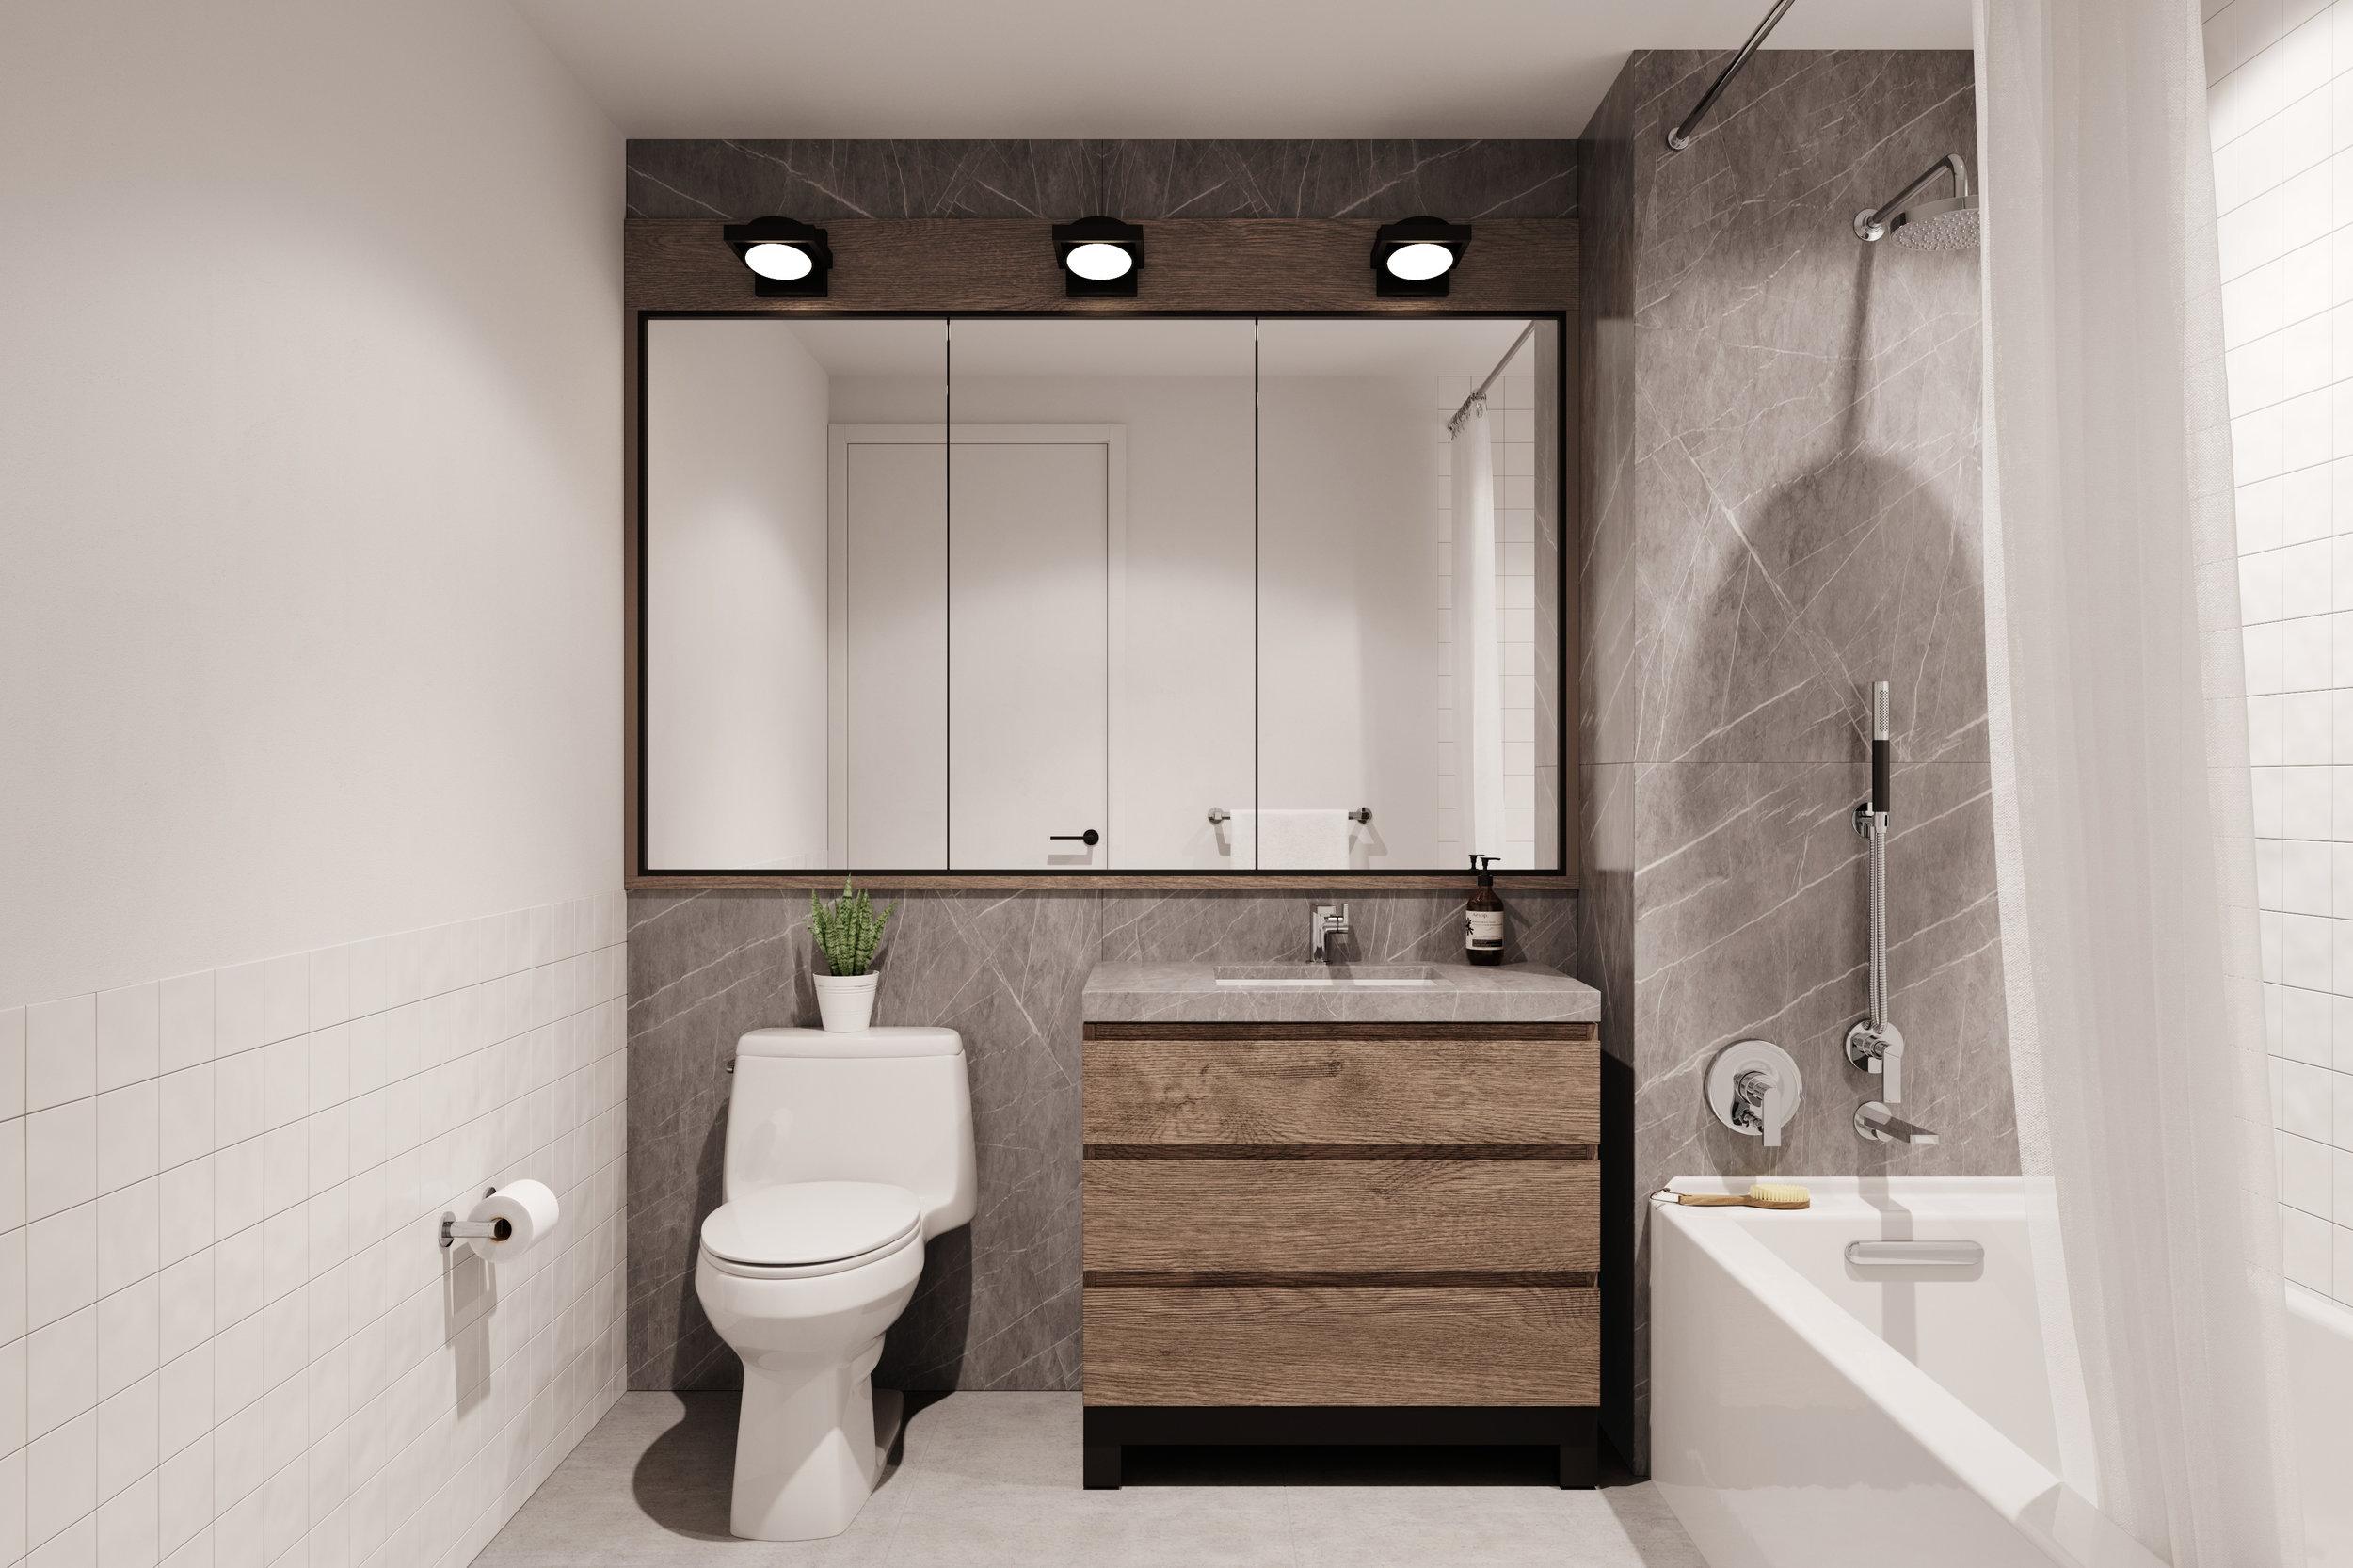 FINAL 180917 30th st Bathrooms_Camera_001.jpg